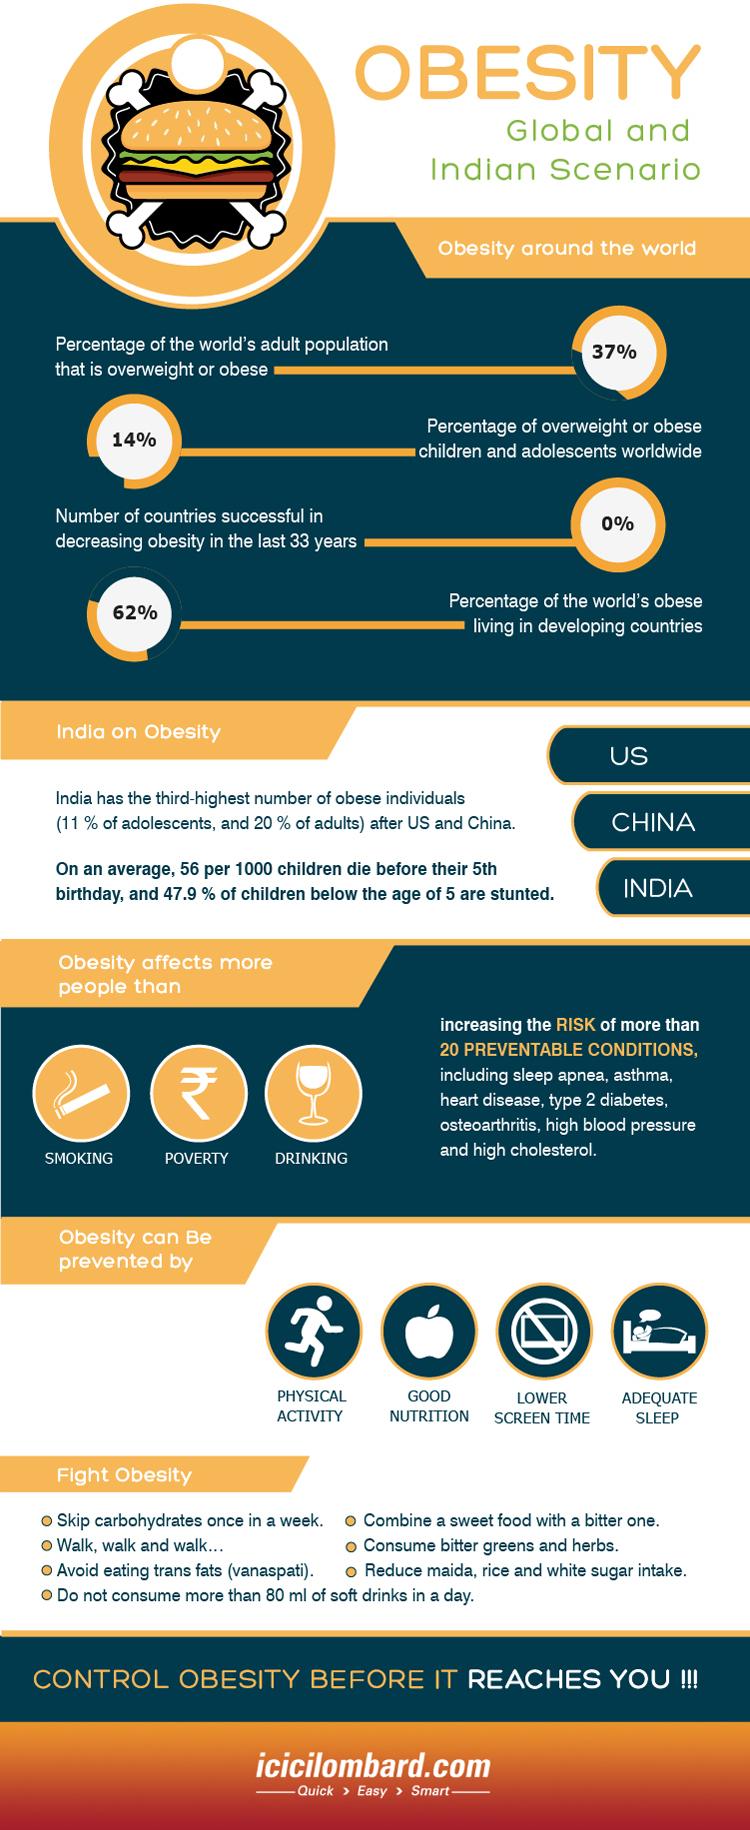 20151014-obesity-global-and-indian-scenario